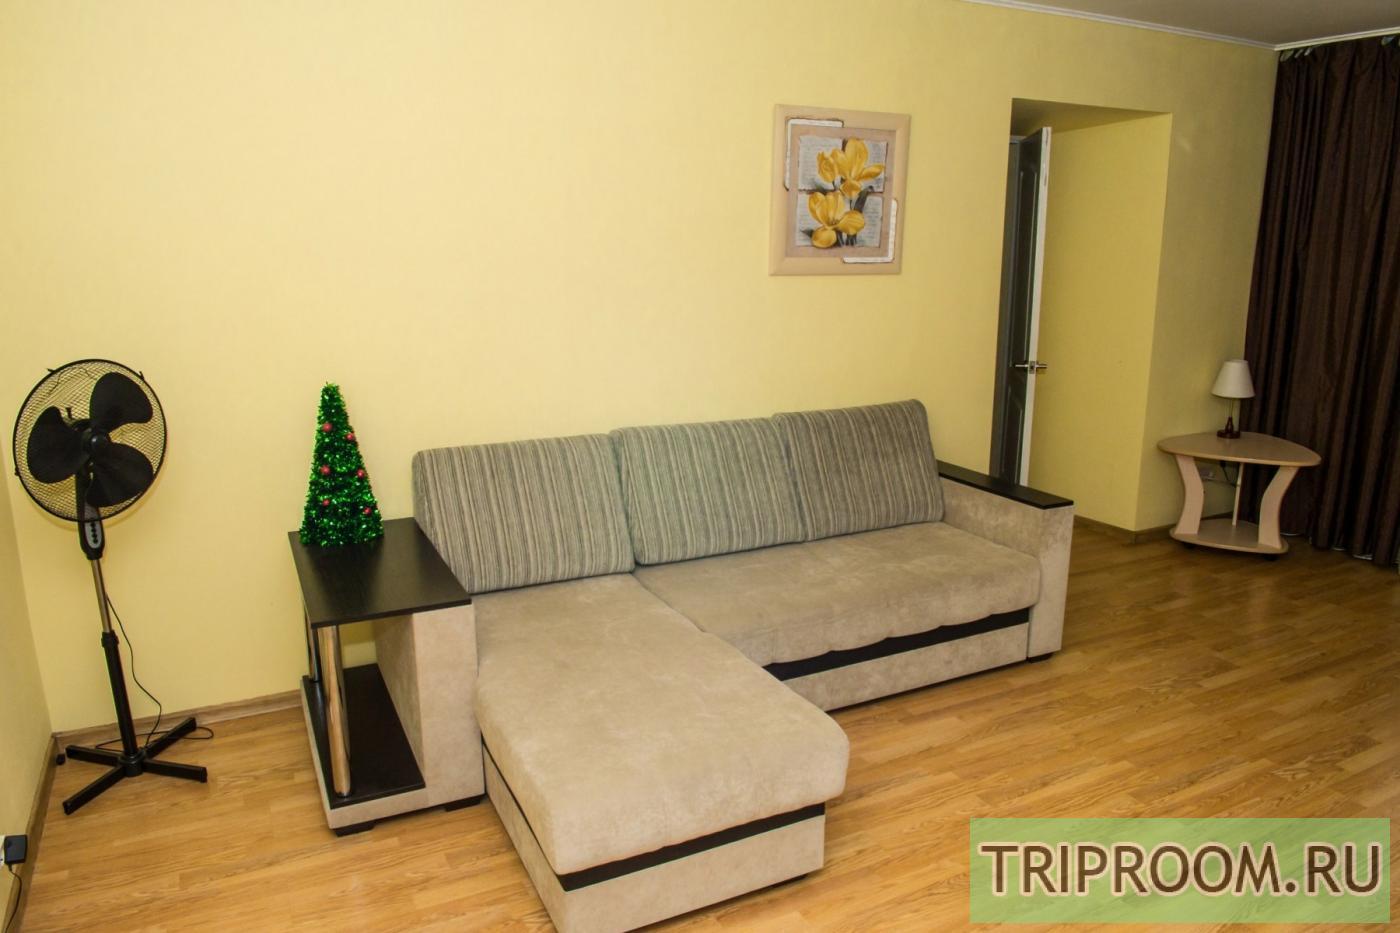 2-комнатная квартира посуточно (вариант № 20494), ул. Газеты звезда, фото № 3